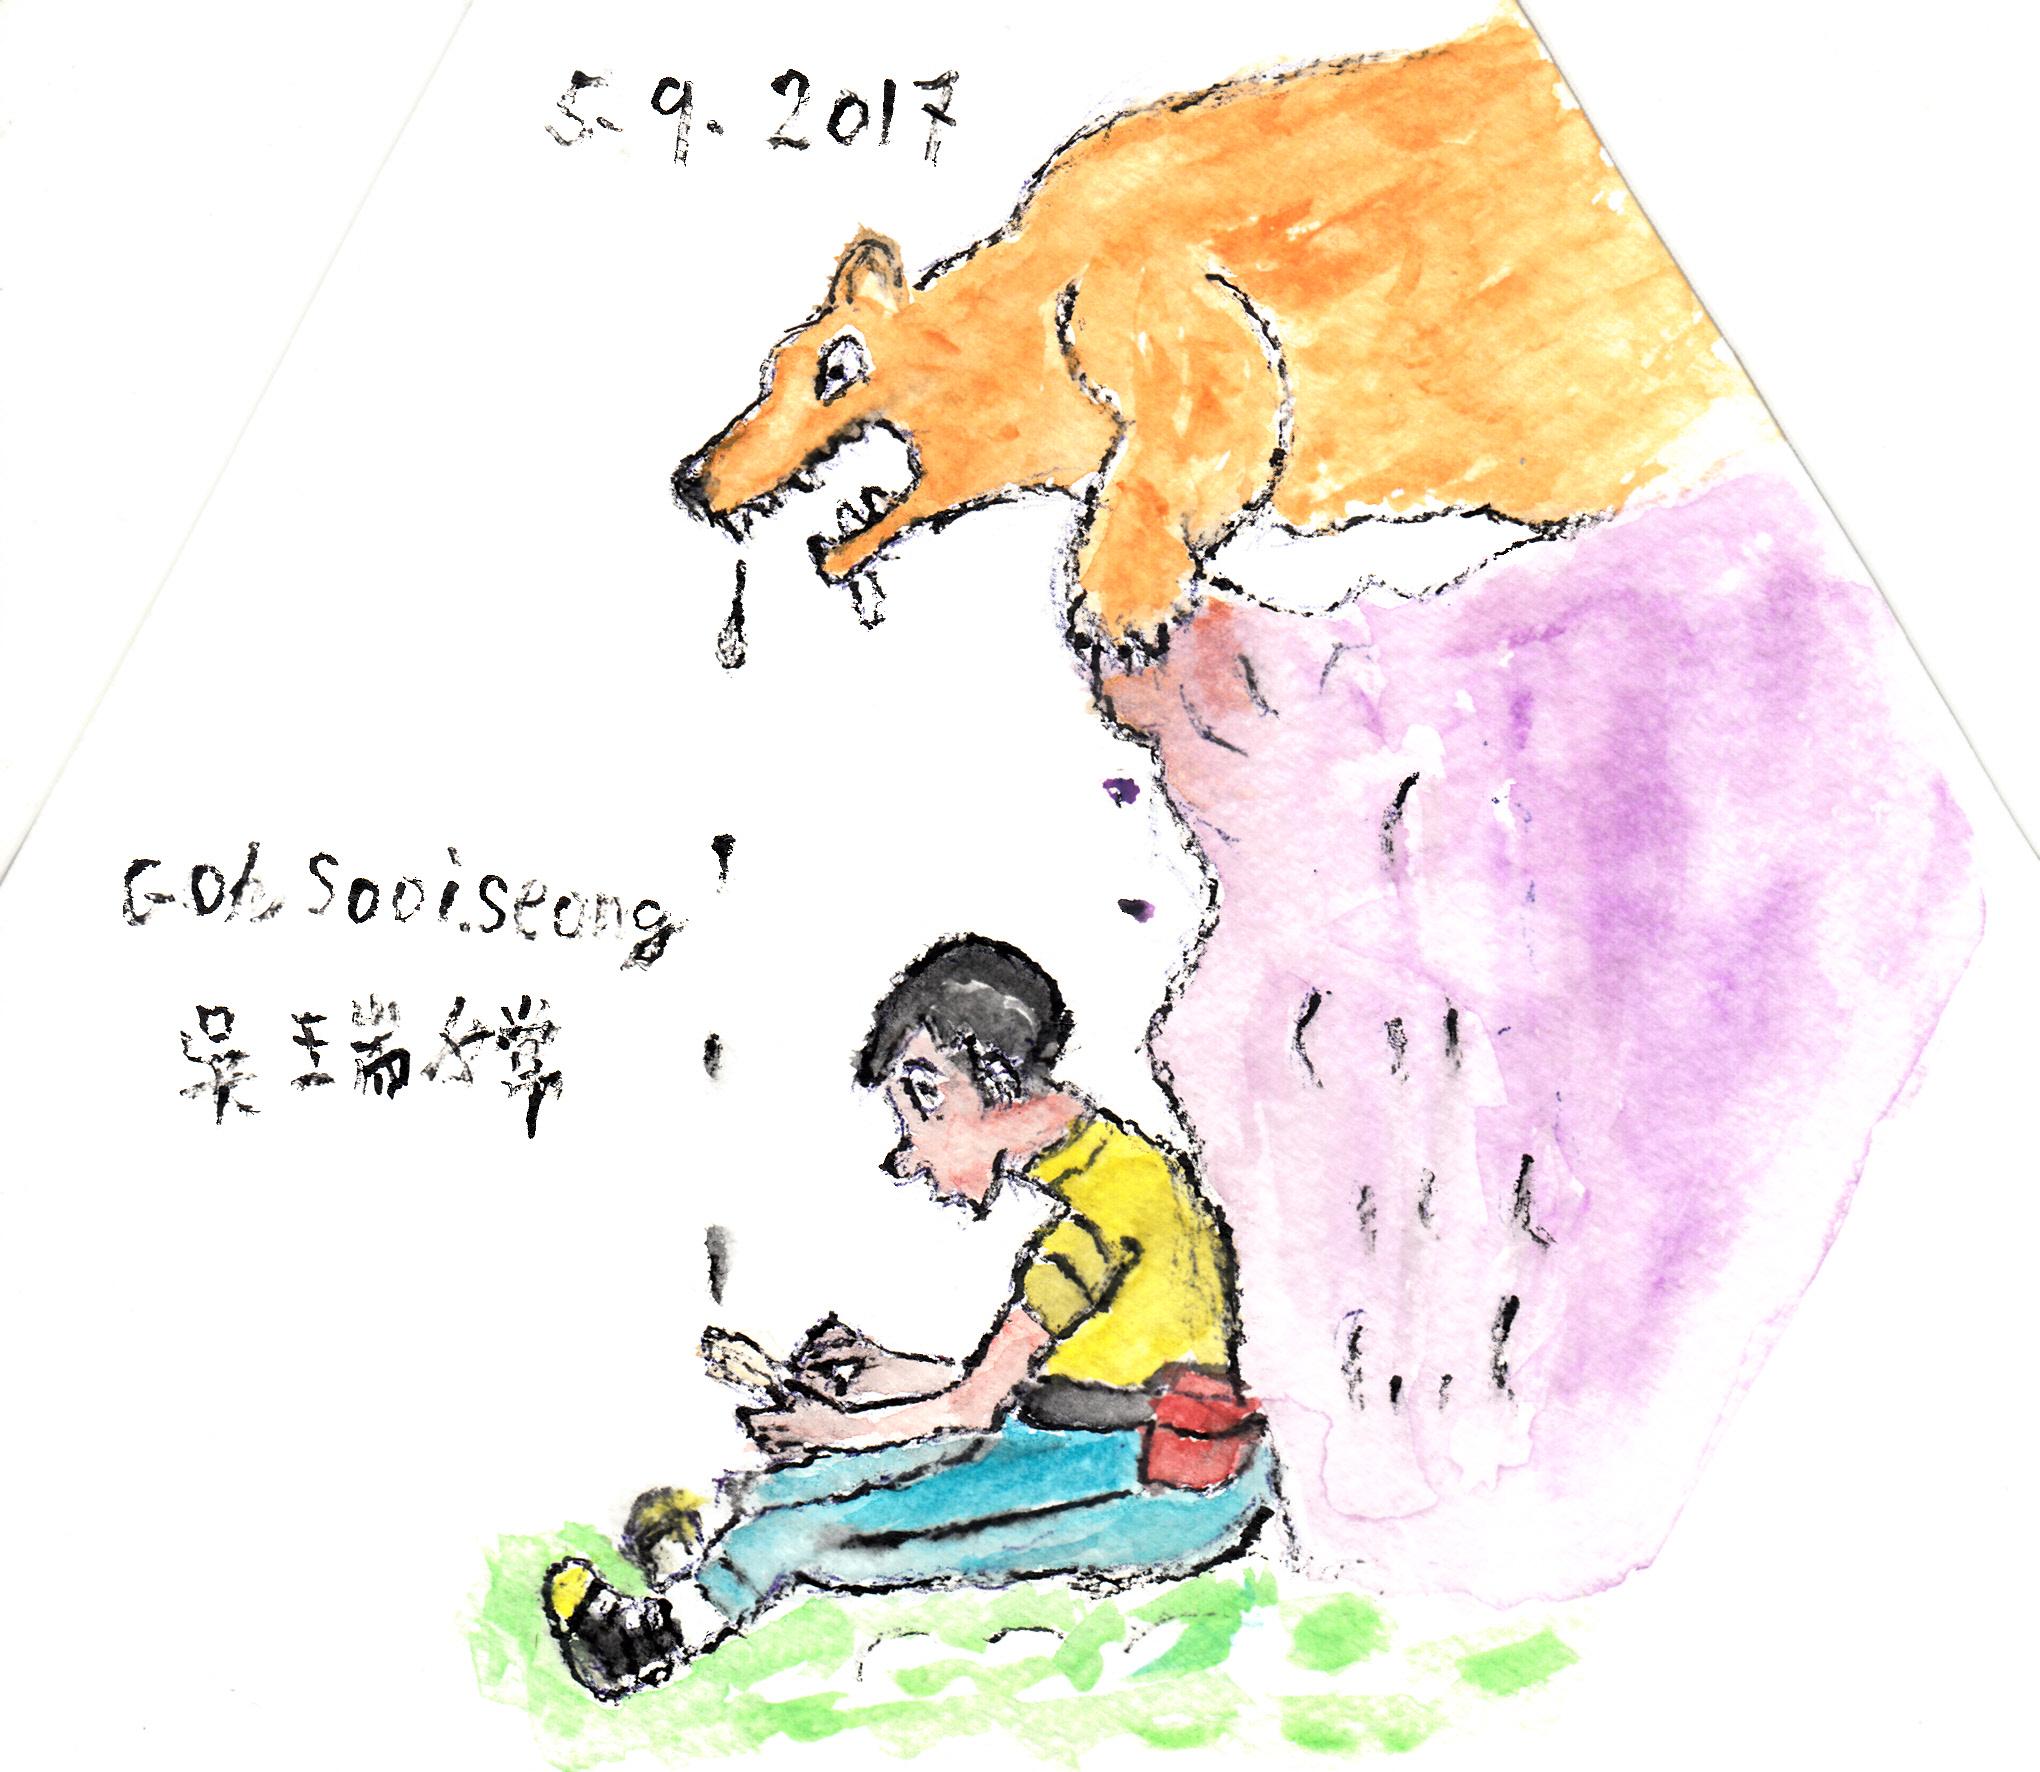 Goh Sooi Seong 19.jpg